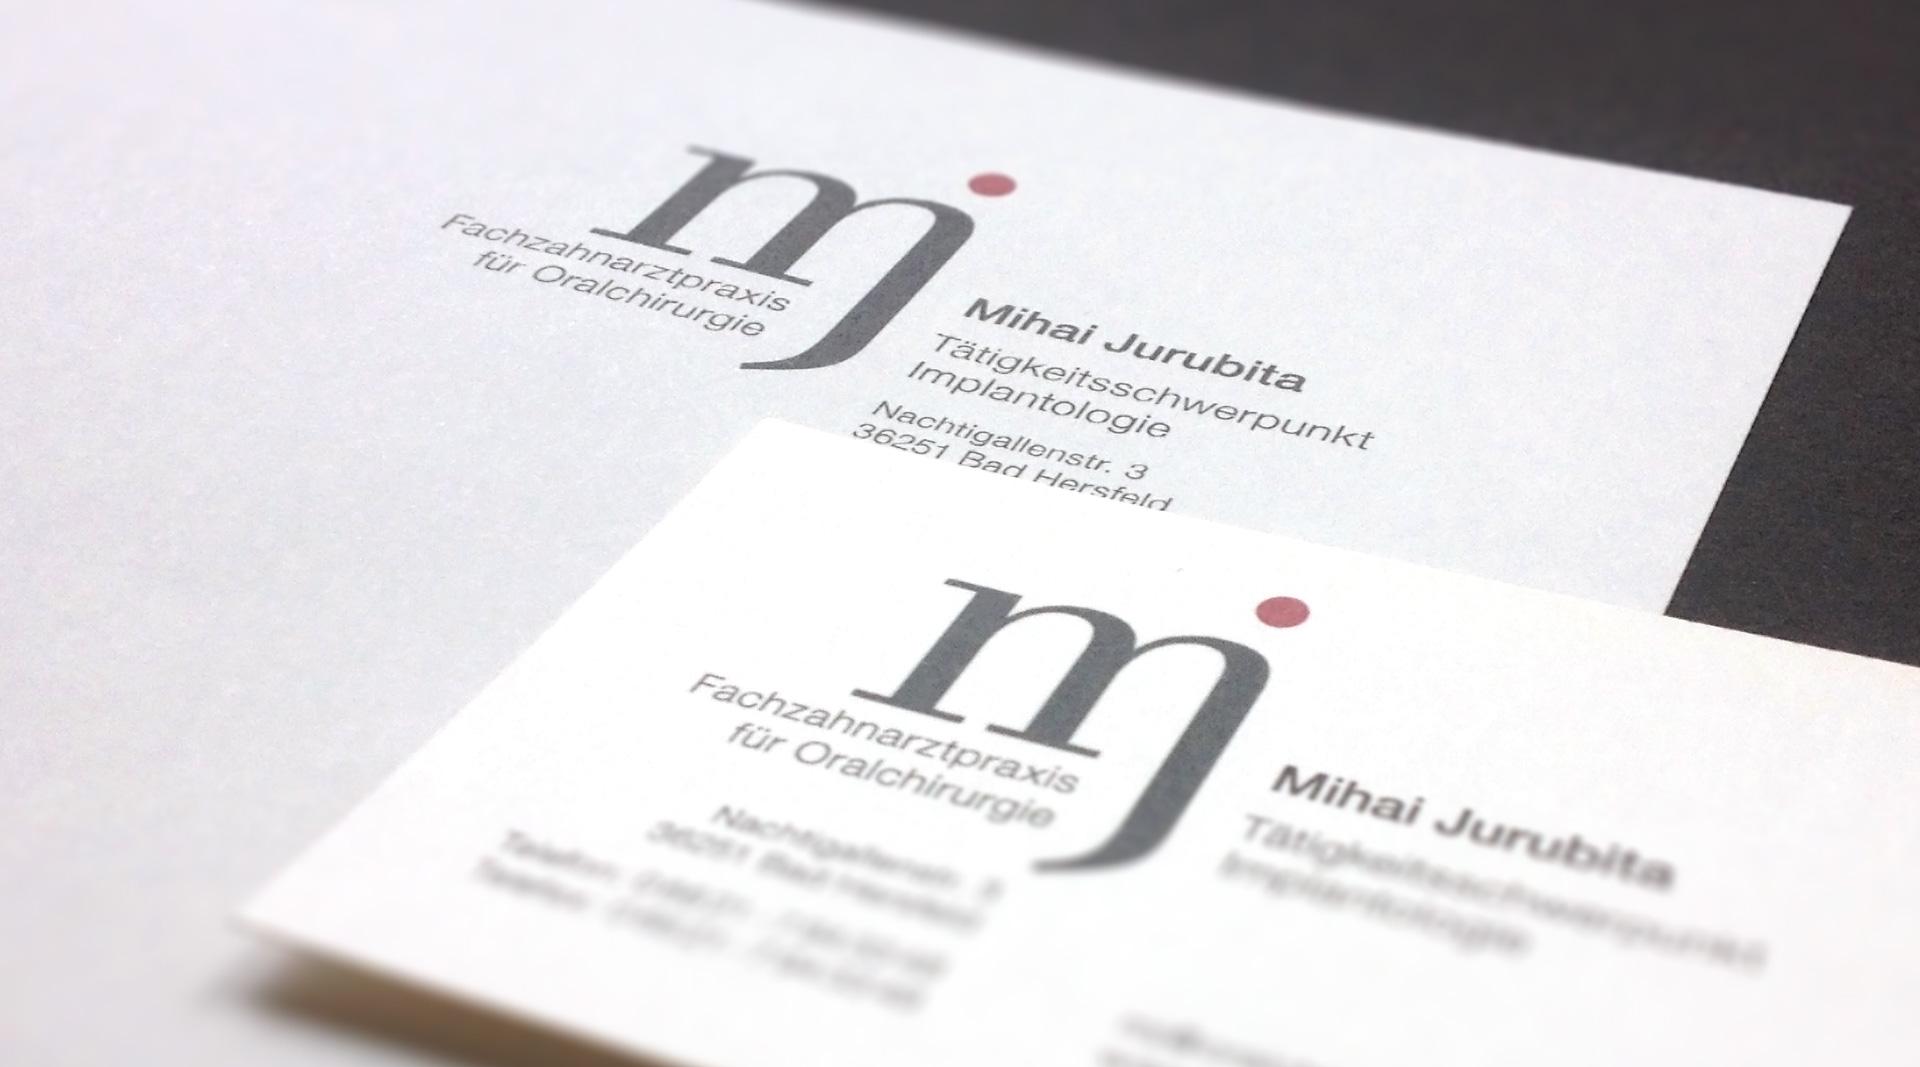 Mihai Jurubita Bad Hersfeld, Wort-Bildmarke